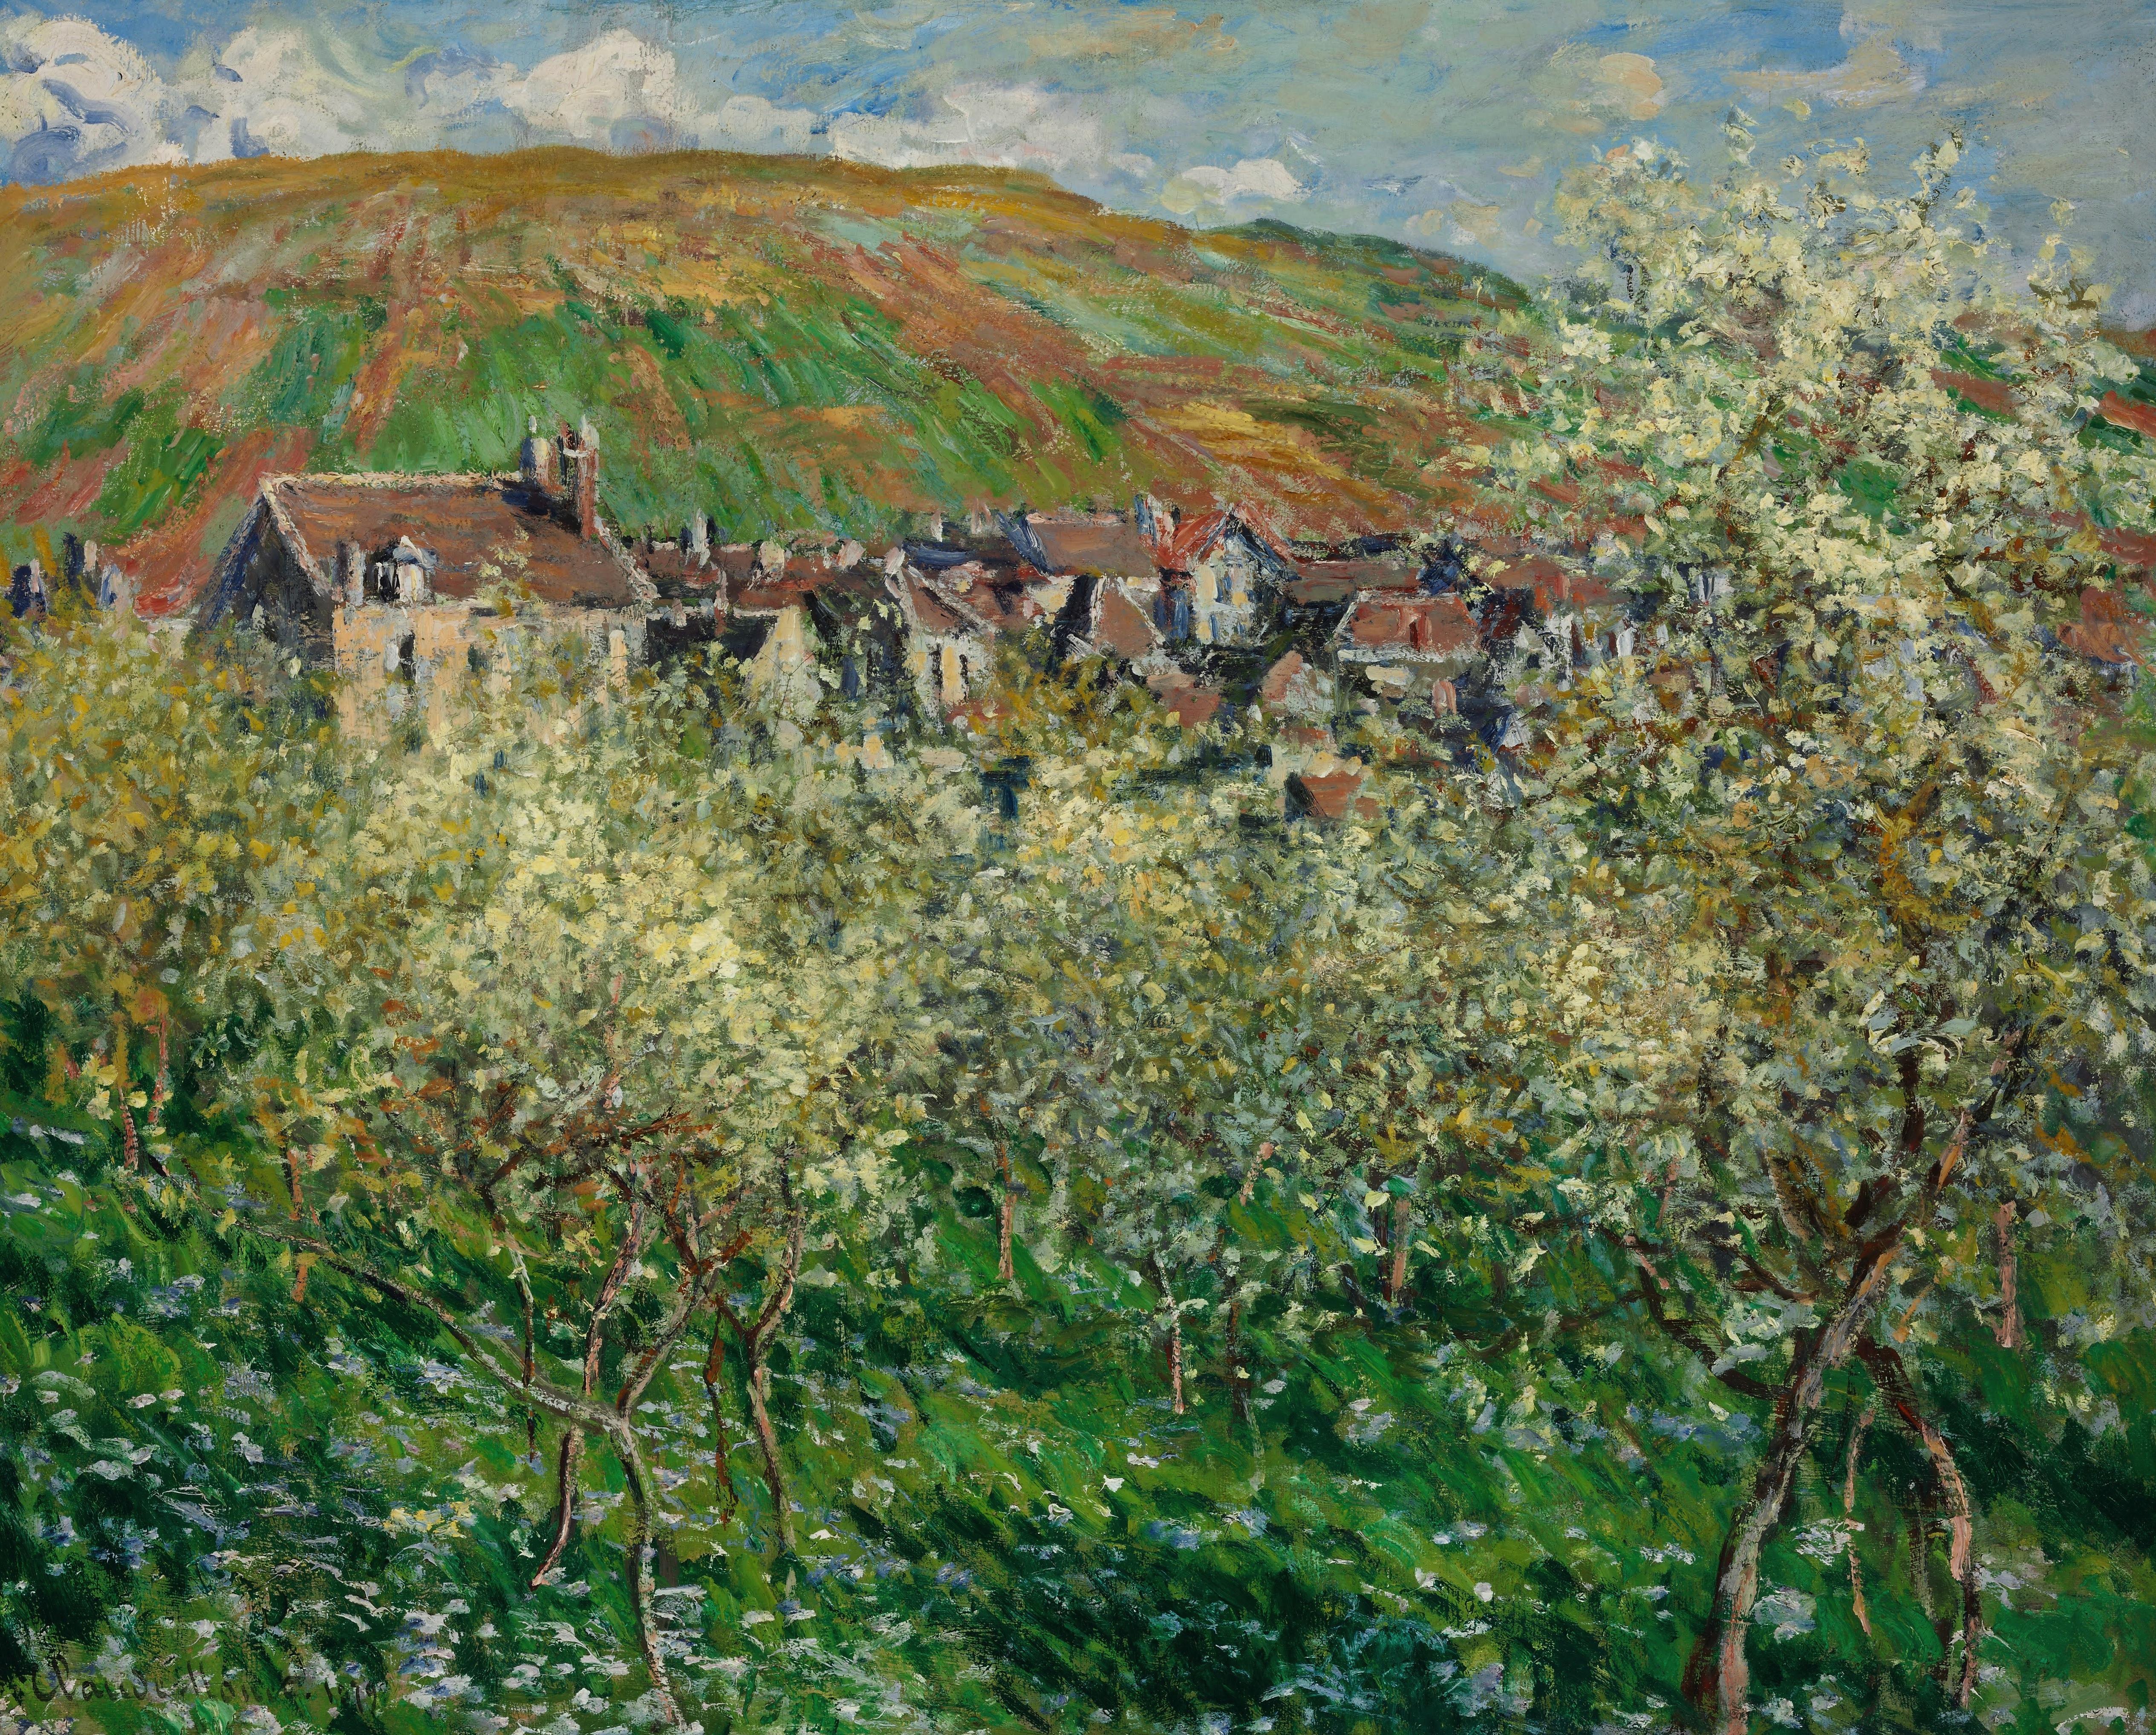 Free Images : landscape, tree, nature, sky, vineyard, meadow, flower ...